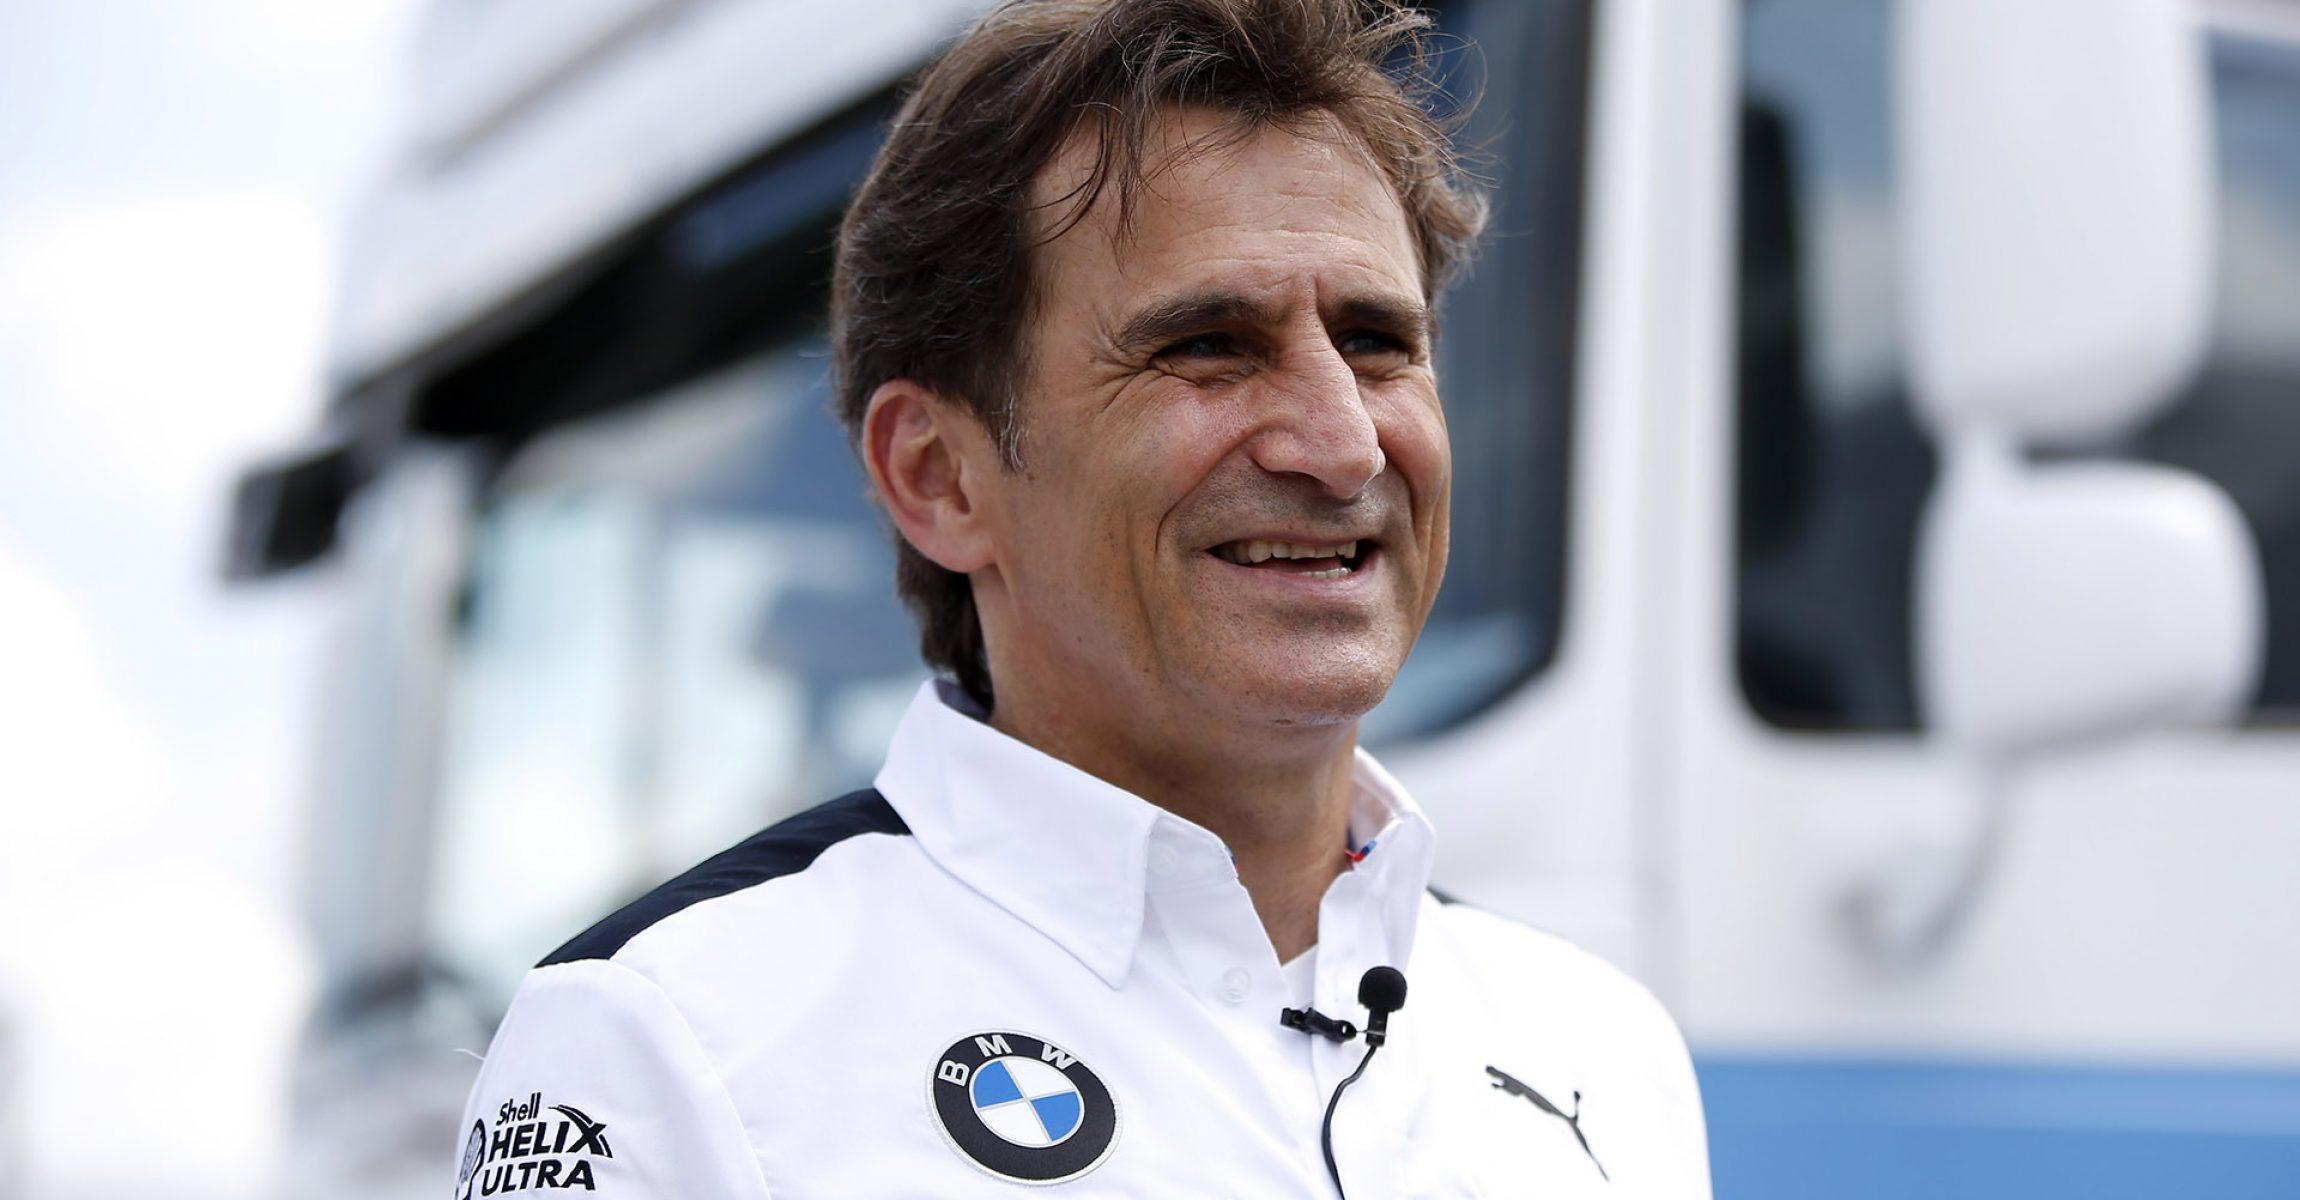 Hungaroring (HUN) 1st June 2018. BMW M Motorsport, DTM, Round 3, Alessandro Zanardi (ITA), BMW works driver and BMW brand ambassador